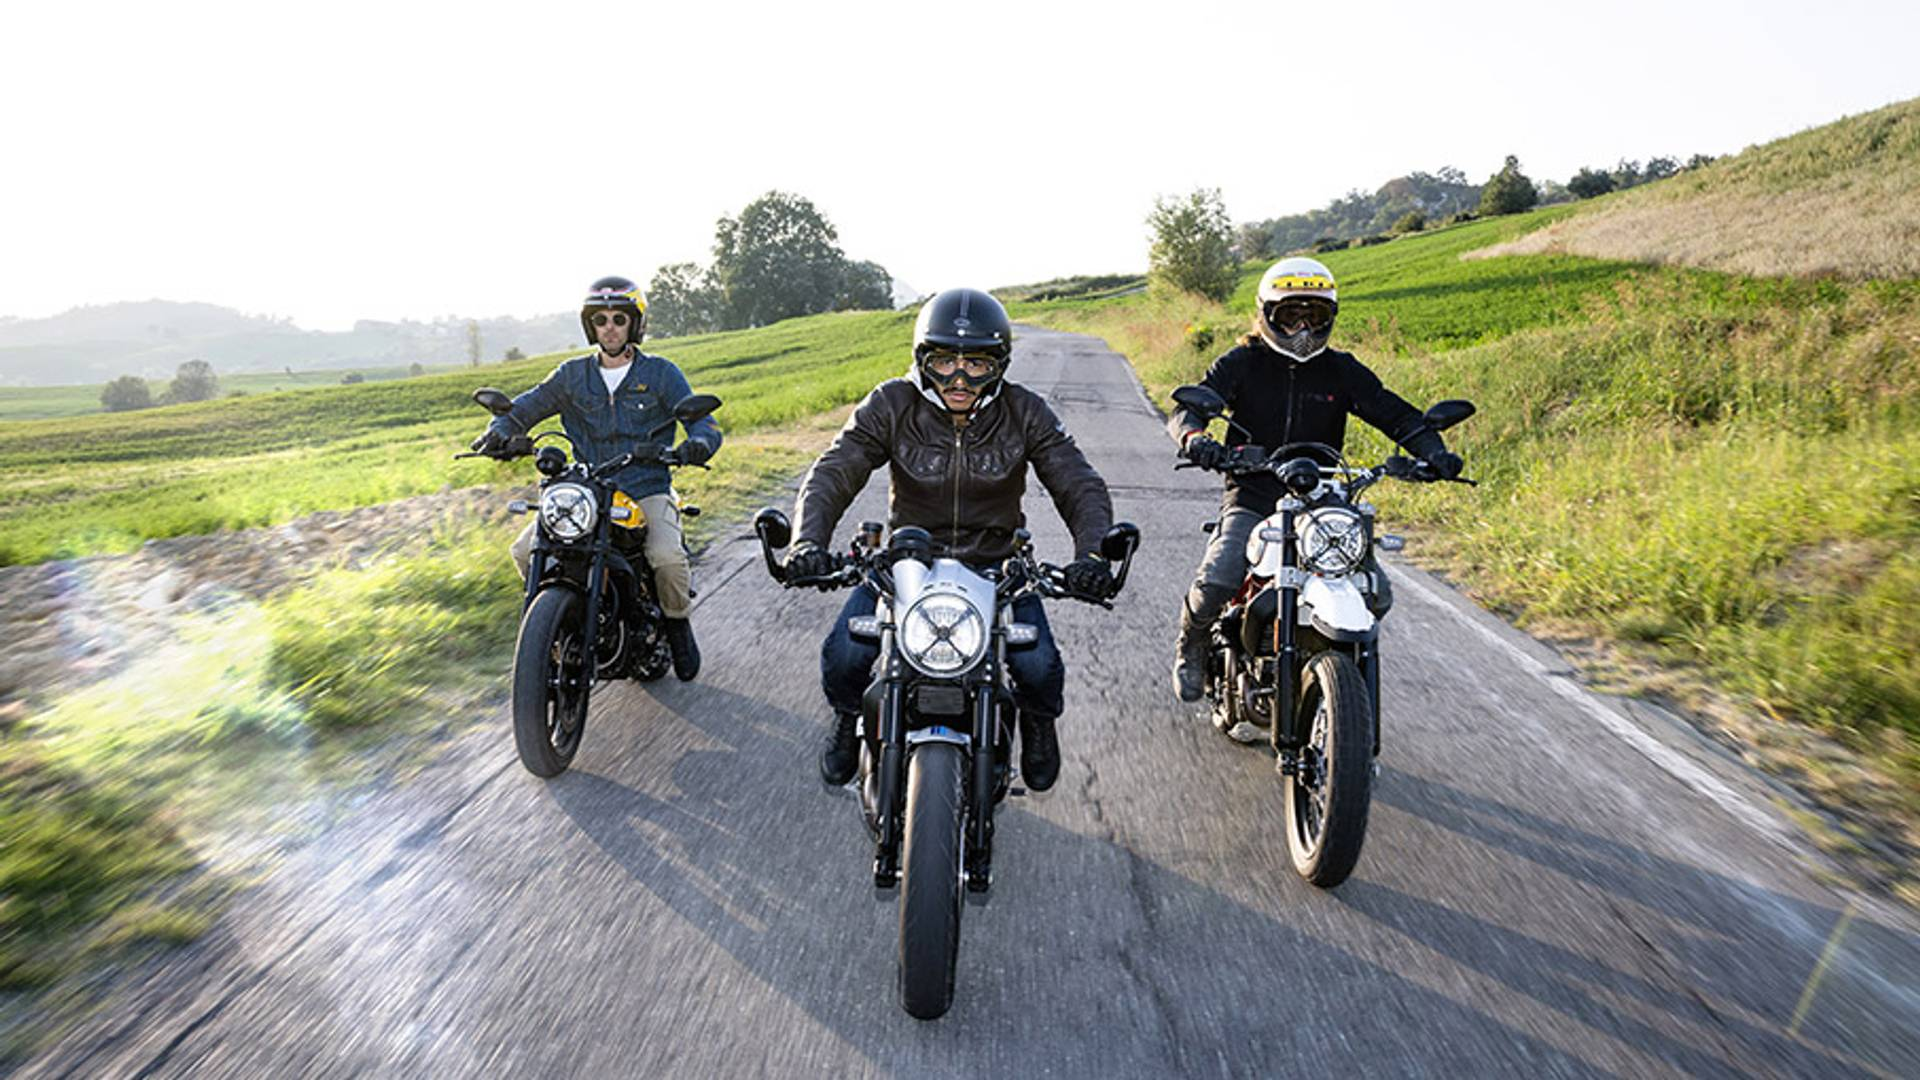 More Scramblers Ducati Unveils Three New Variants